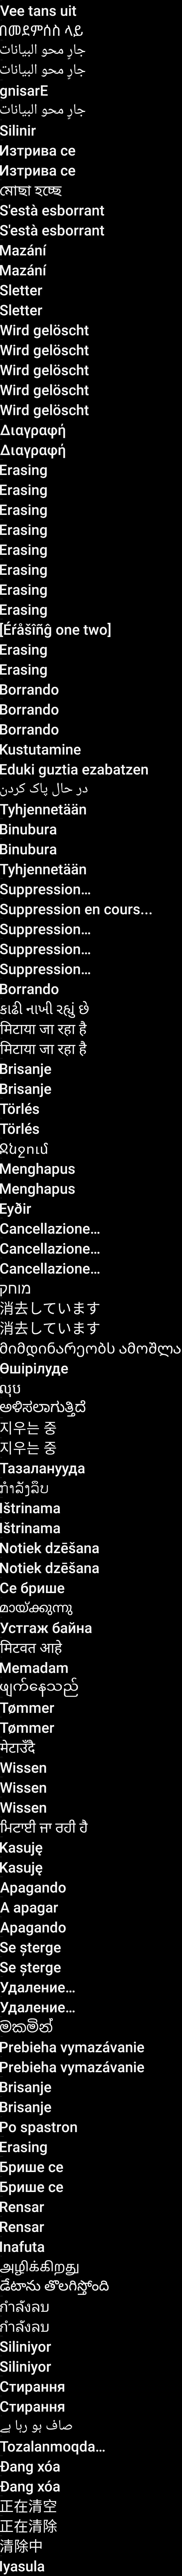 res-xxxhdpi/images/erasing_text.png